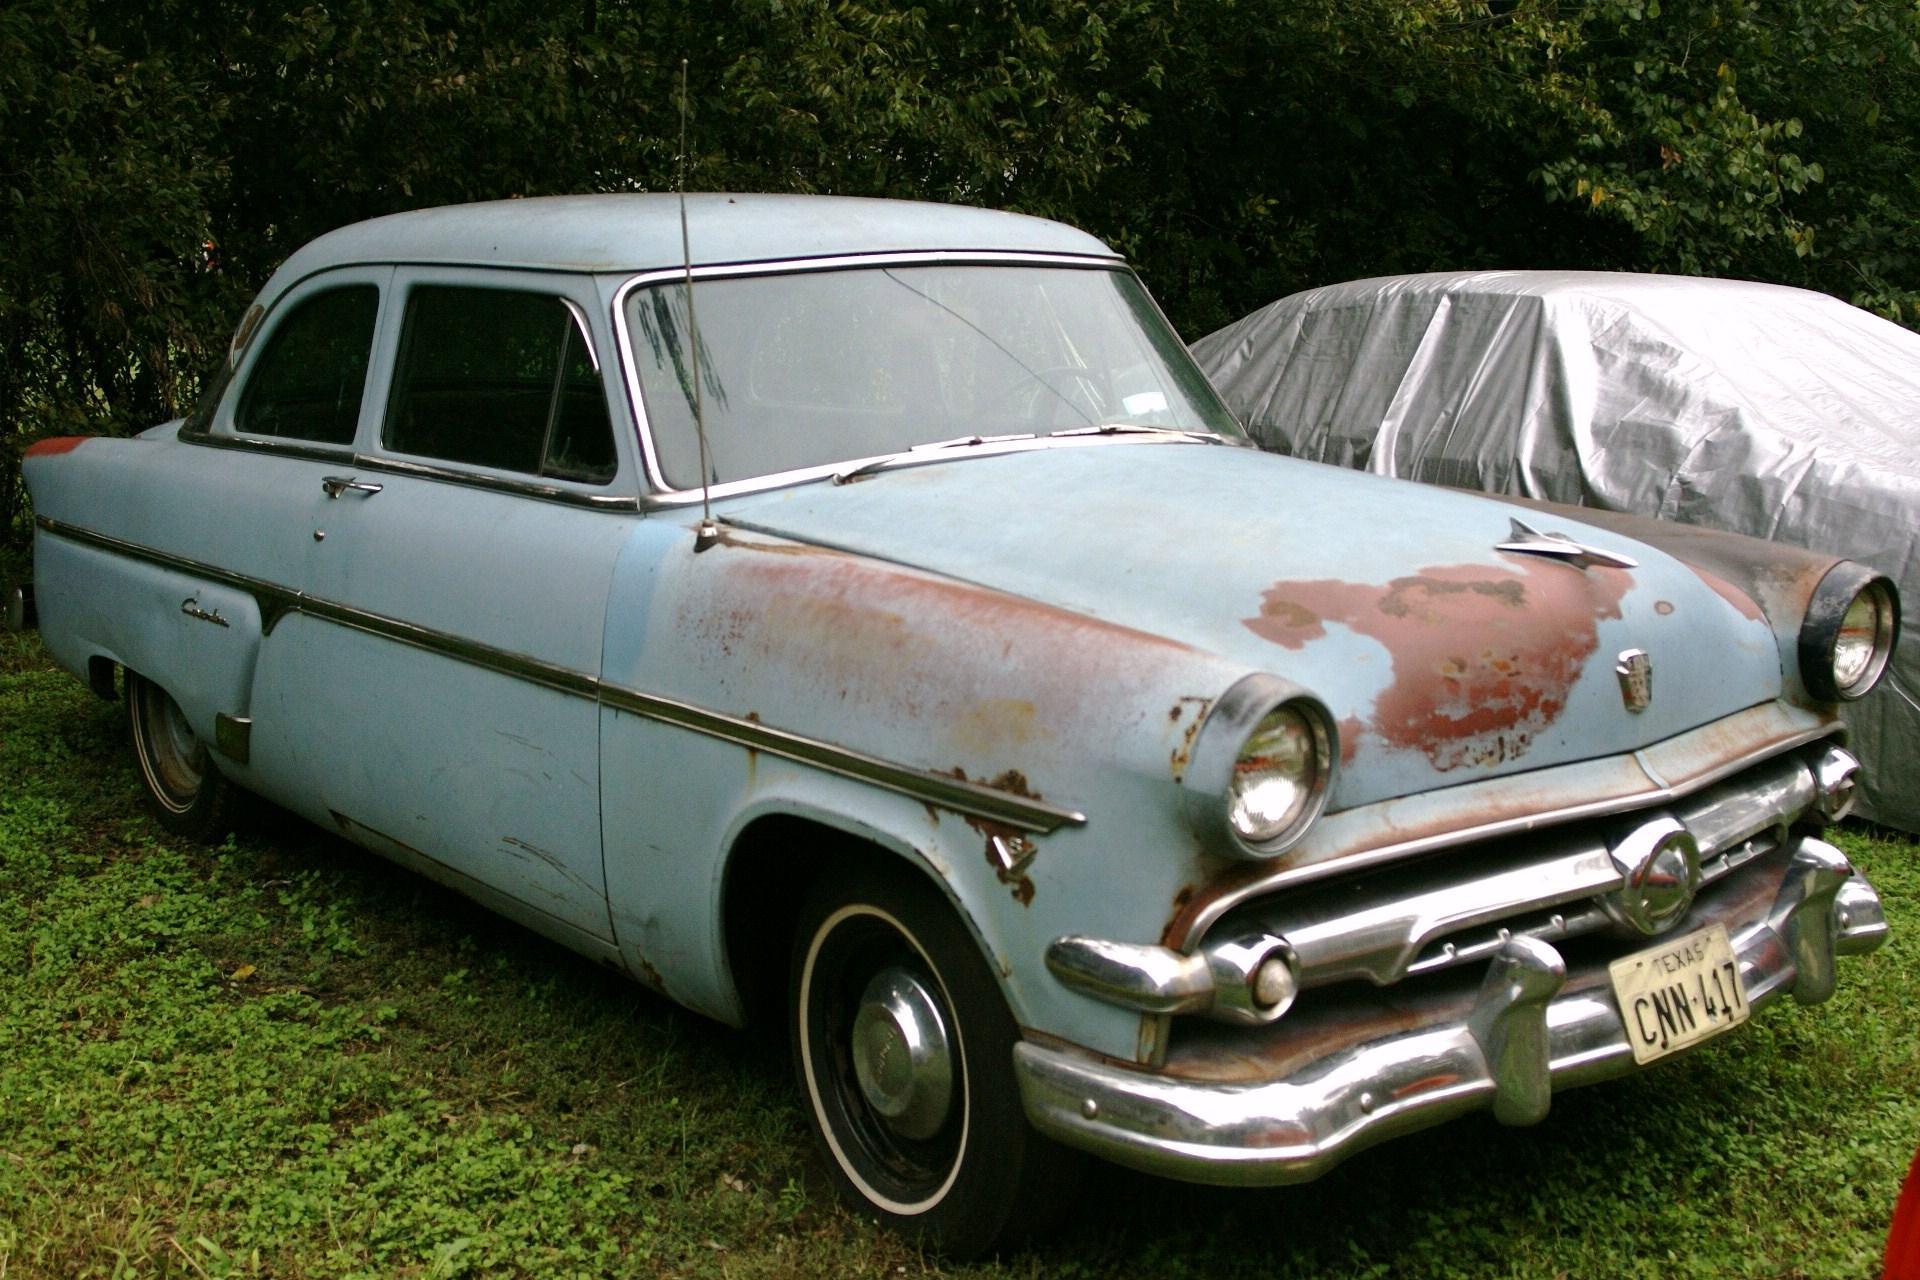 ZB_7378] 1954 Ford Crestline Wiring Diagram Free DiagramRimen Omit Nizat Lotap Kapemie Ivoro Wned Oliti Hopad Mepta Mohammedshrine  Librar Wiring 101